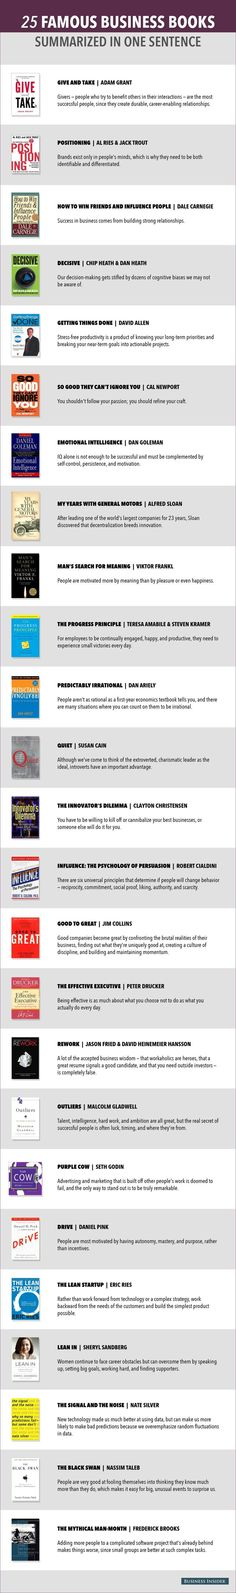 25 Famous Business Books Summarized in one Sentence http://www.businessinsider.com/famous-business-book-summaries-2014-5